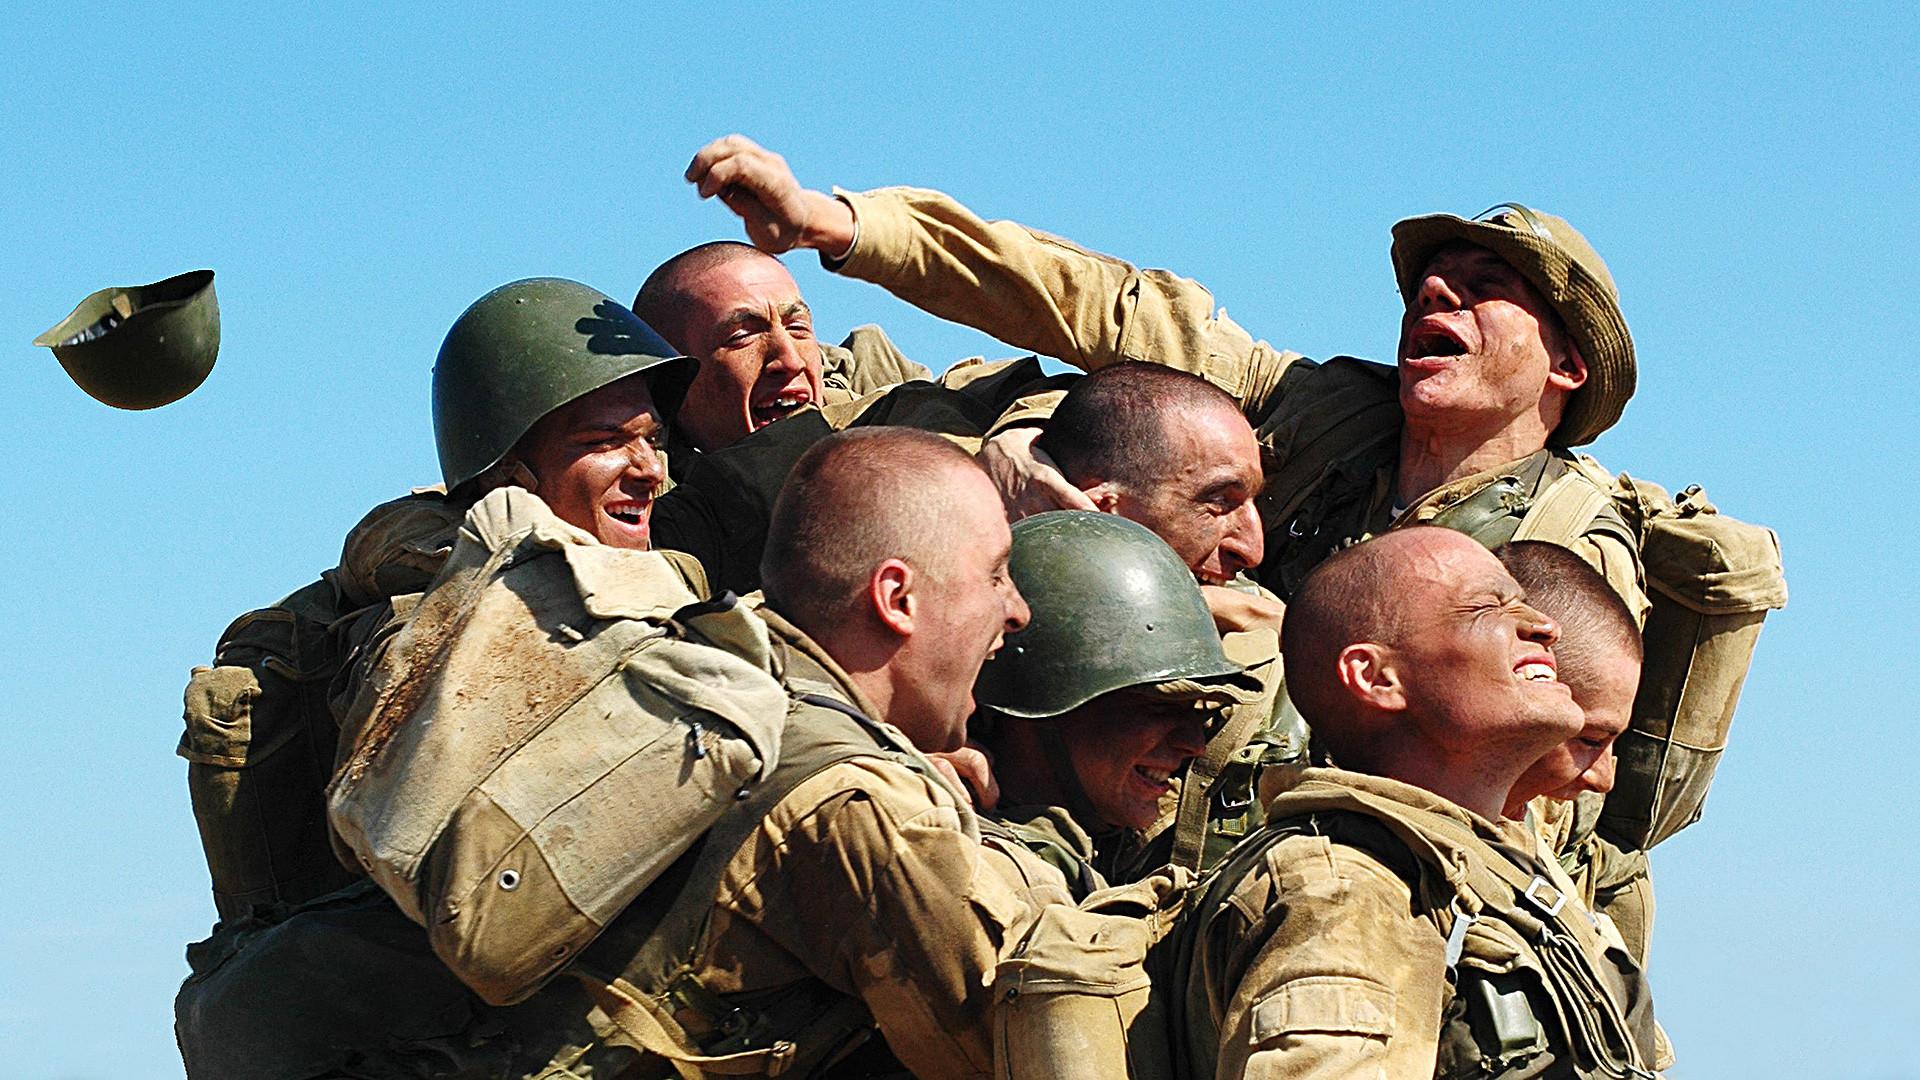 The 9th Company (2005)